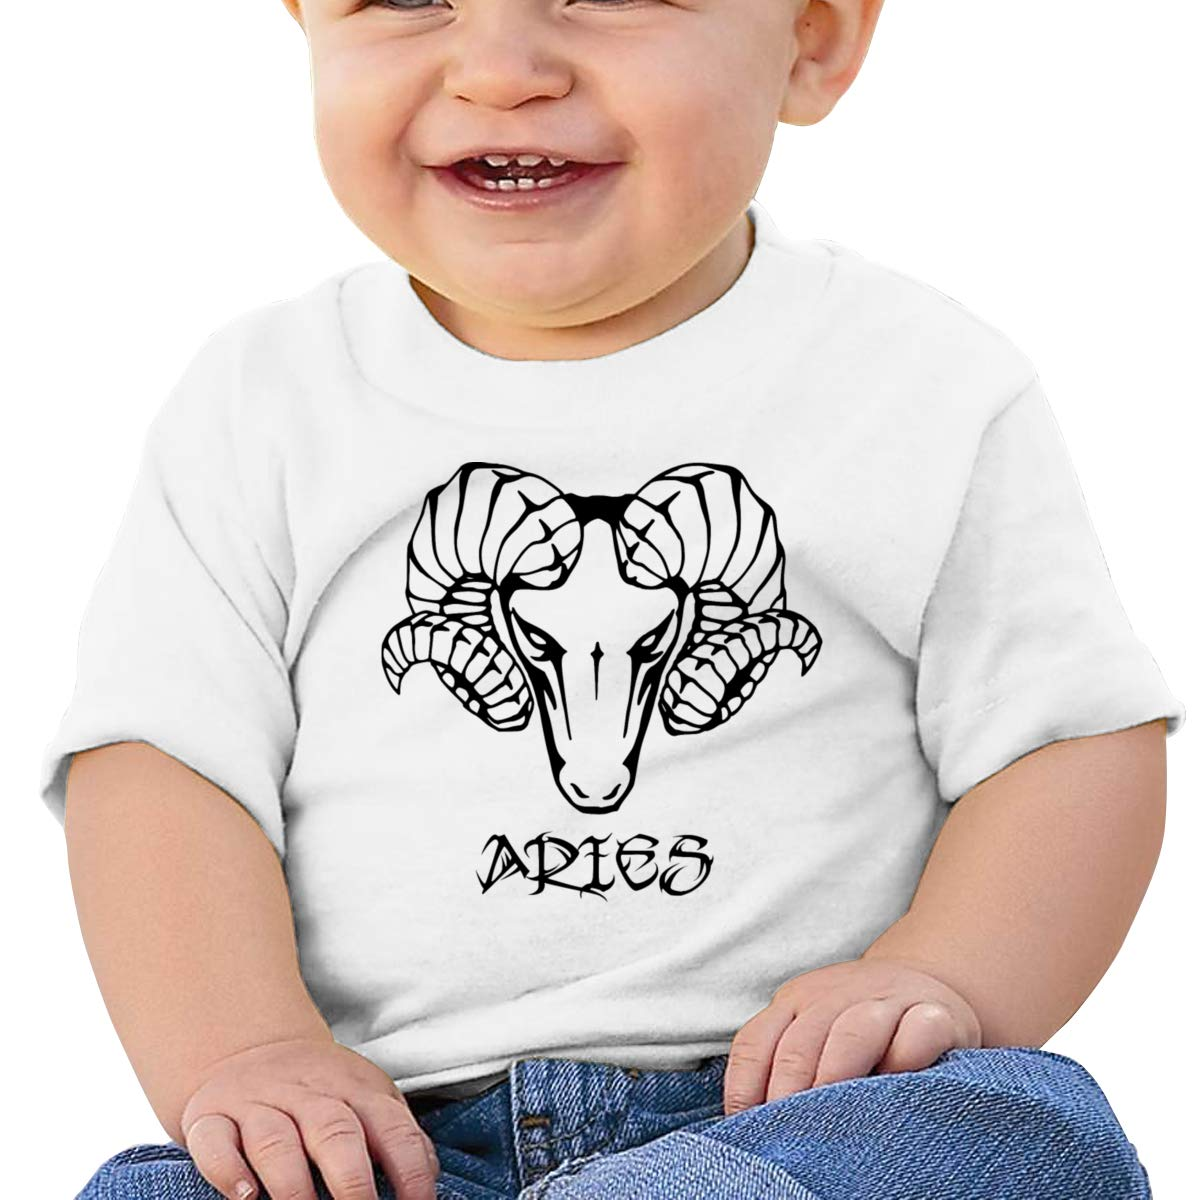 Qiop Nee Black Aries Short-Sleeves T-Shirts Baby Girls